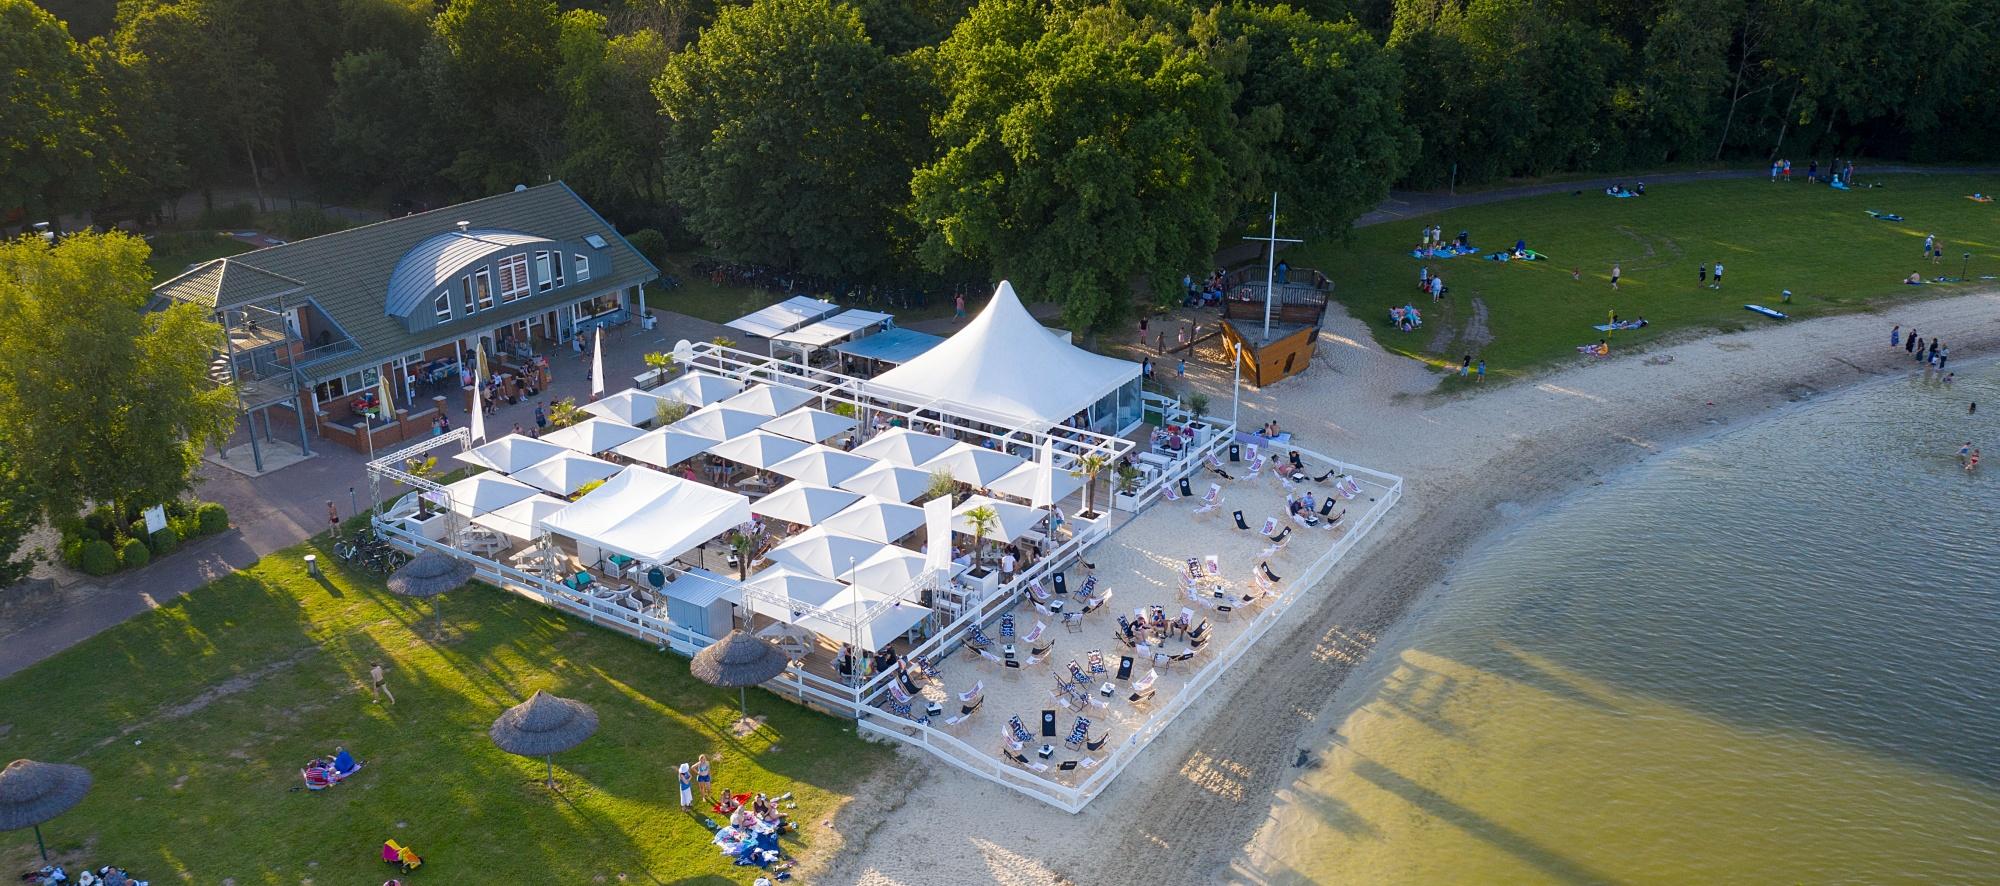 Beachclub am Hartensbergsee